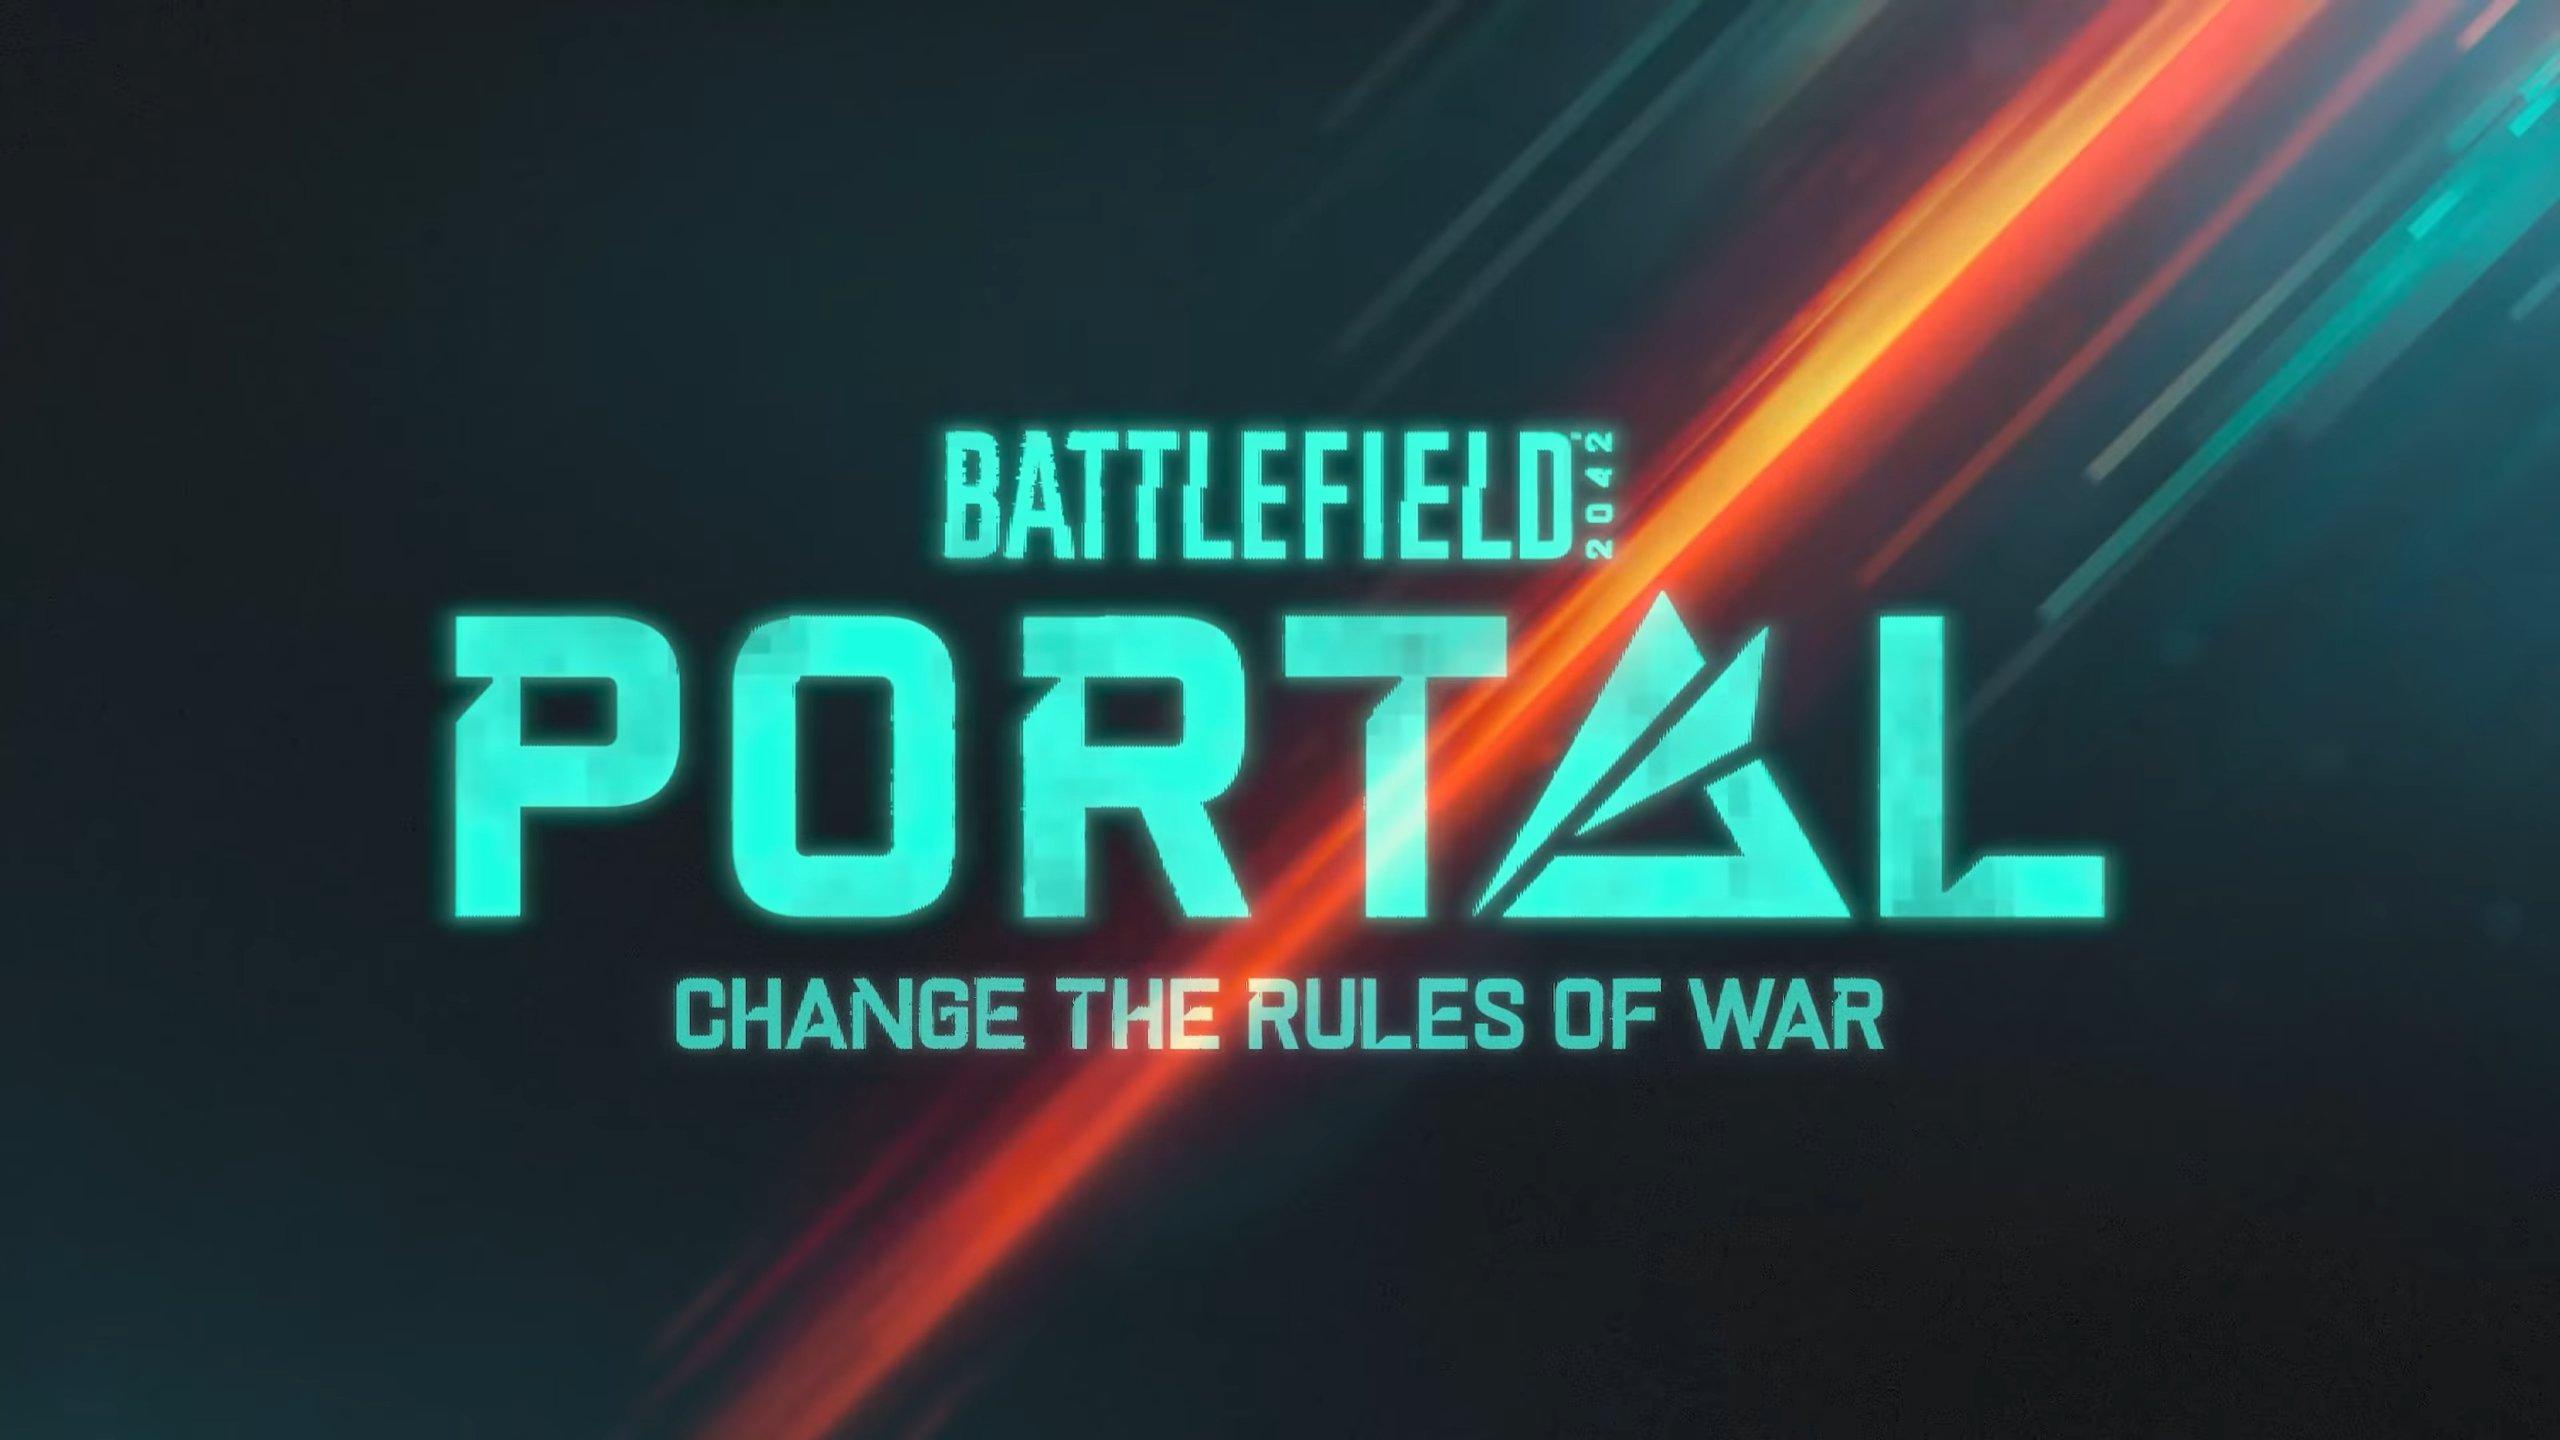 Promotional image of Battlefield Portal's logo.